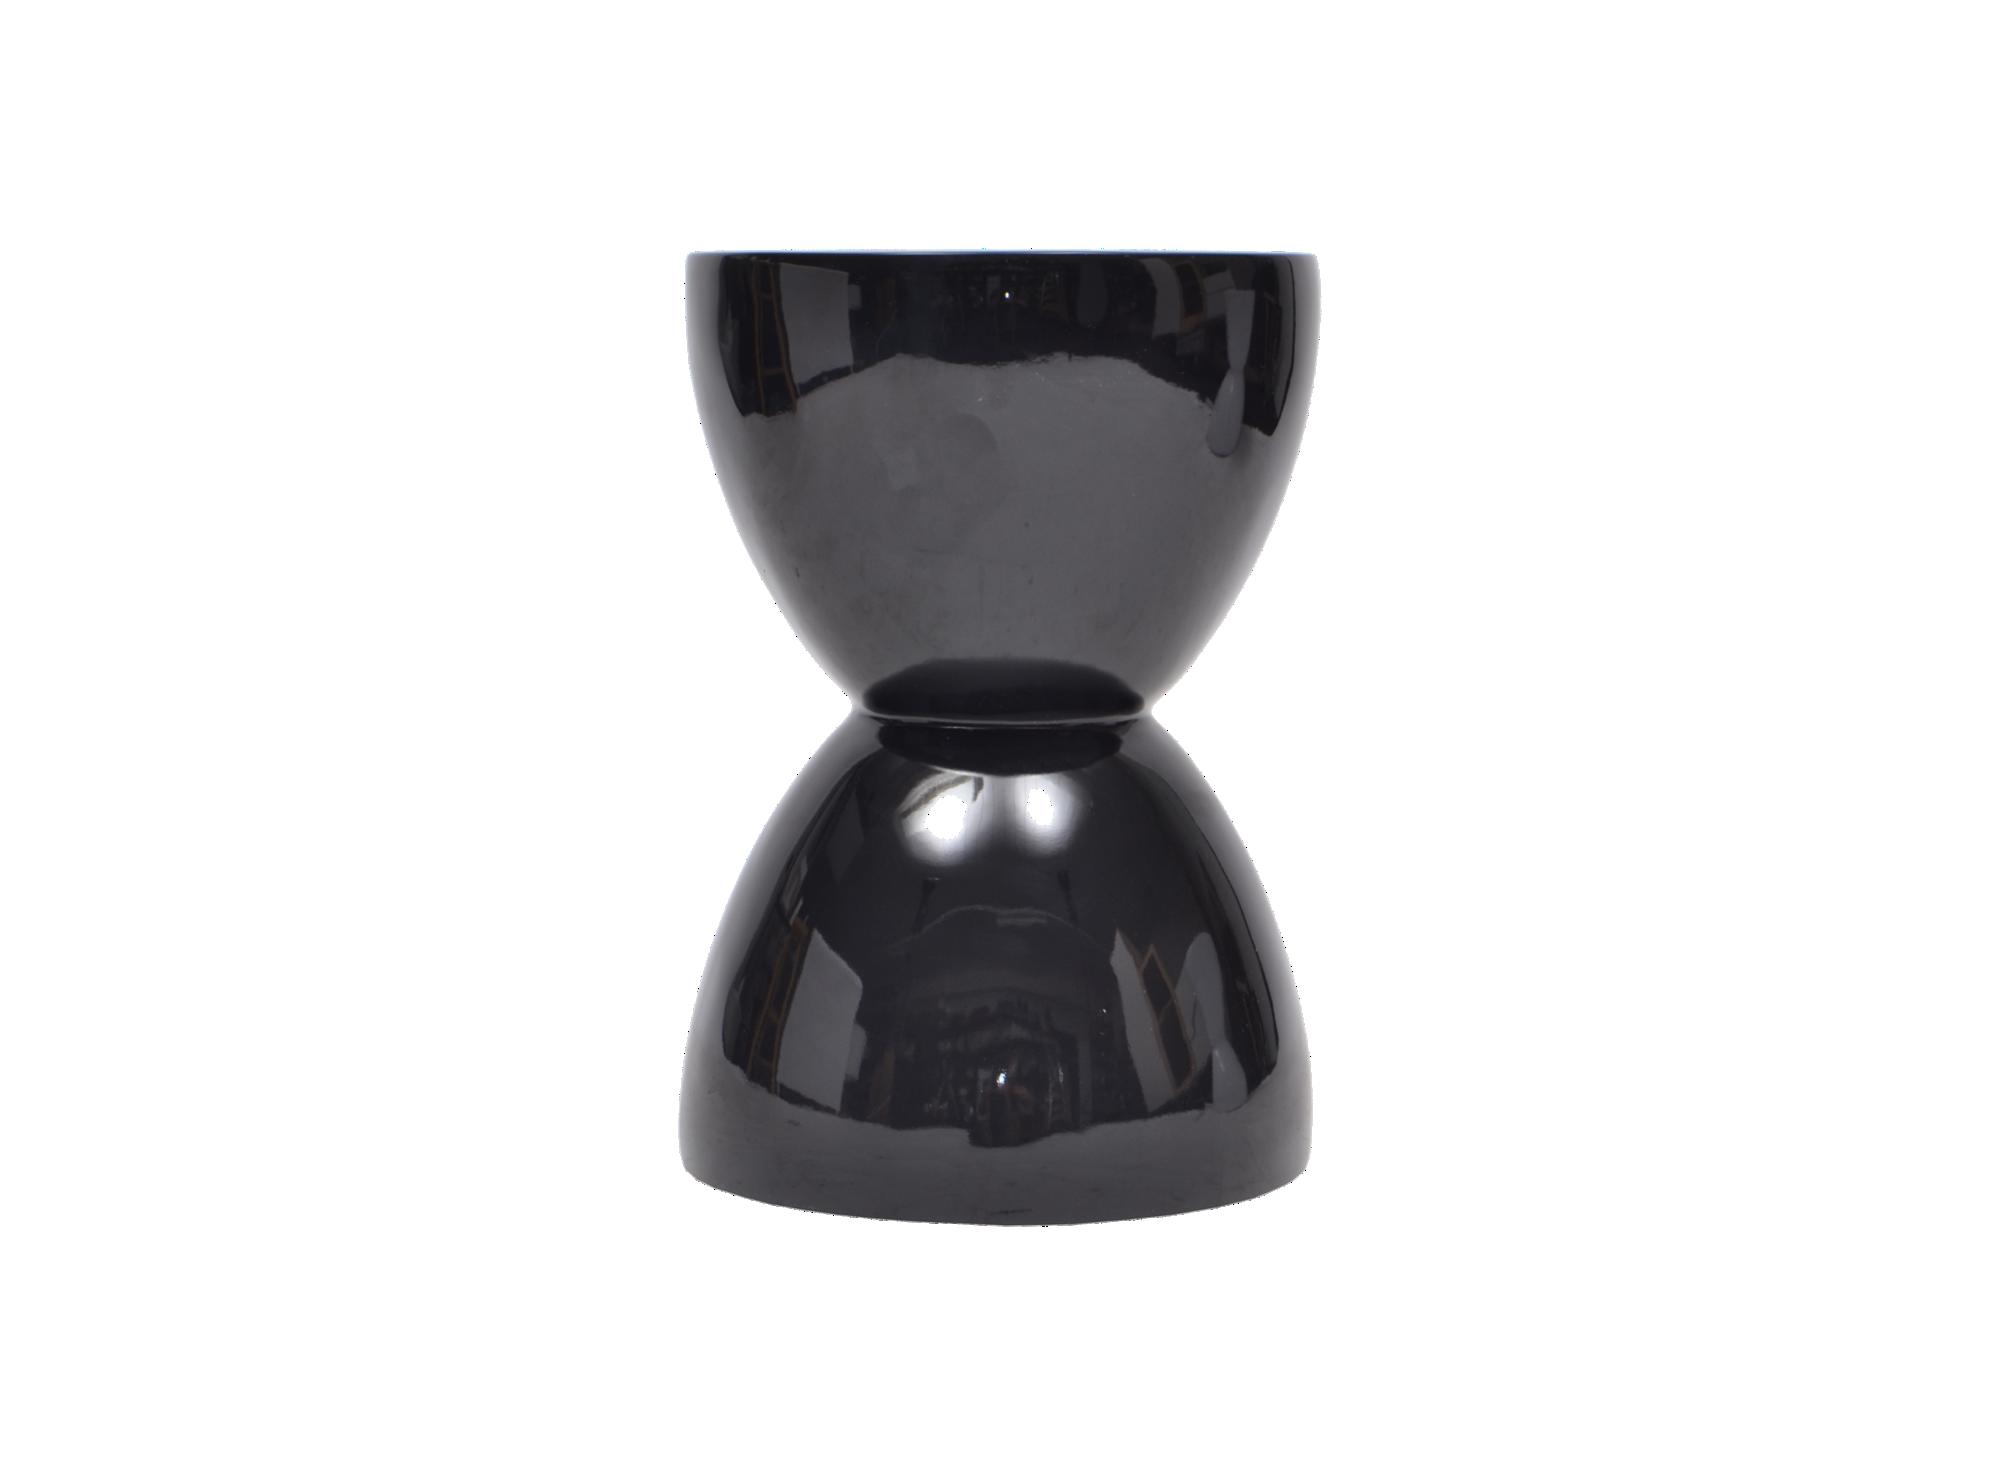 Pouf noir brillant en fibres de verre laque brillant coloris noir. ...